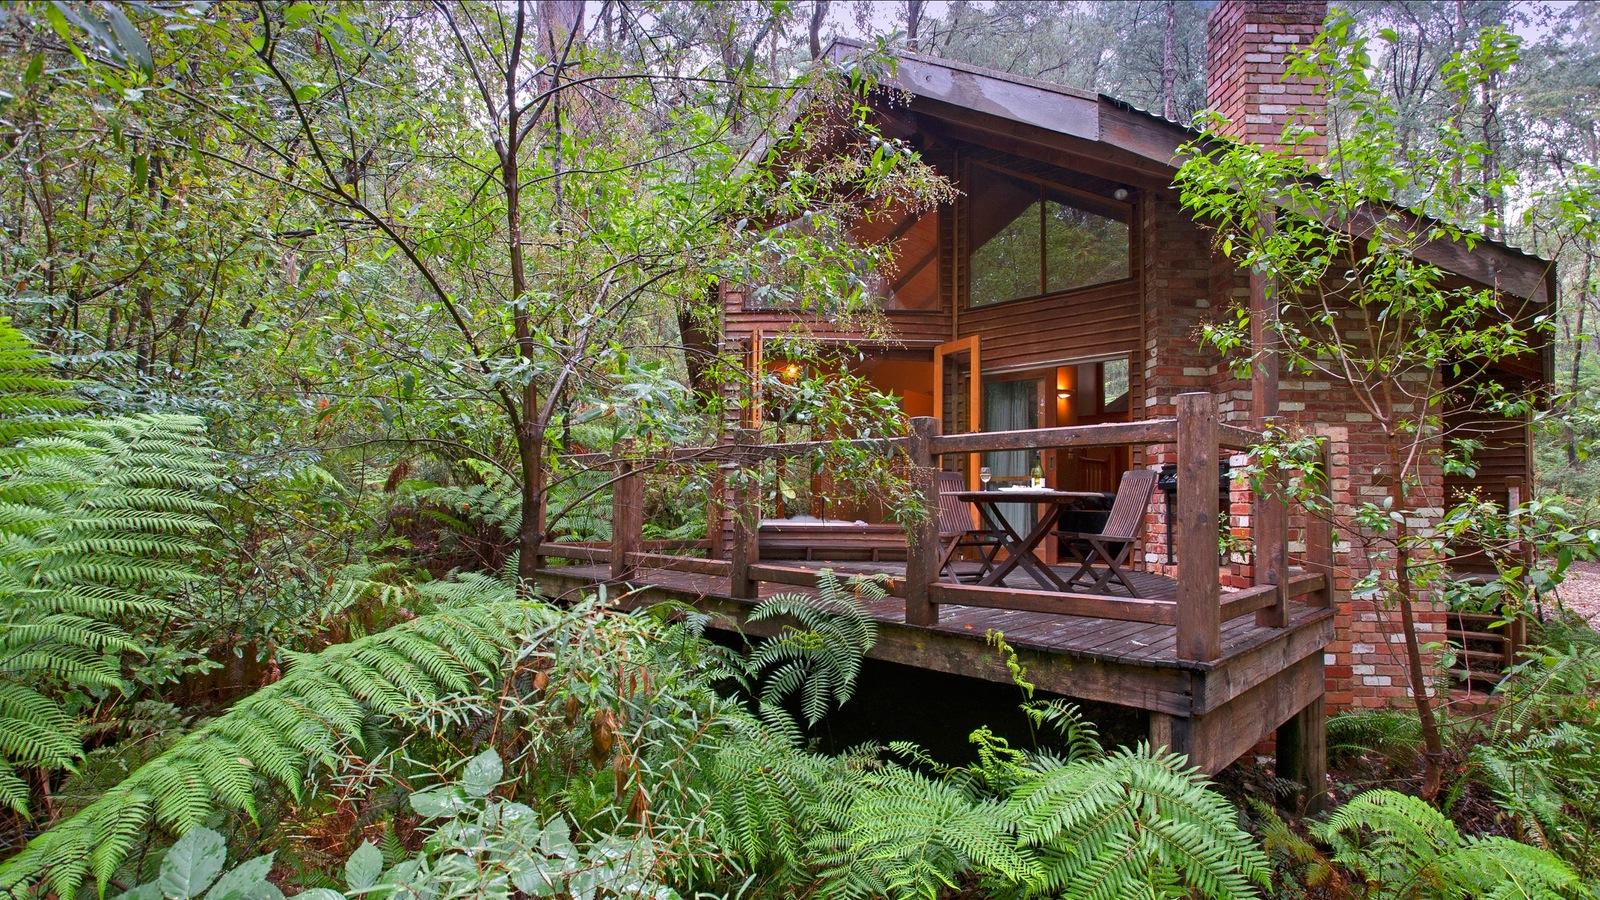 Woodlands Rainforest Retreat Deck View